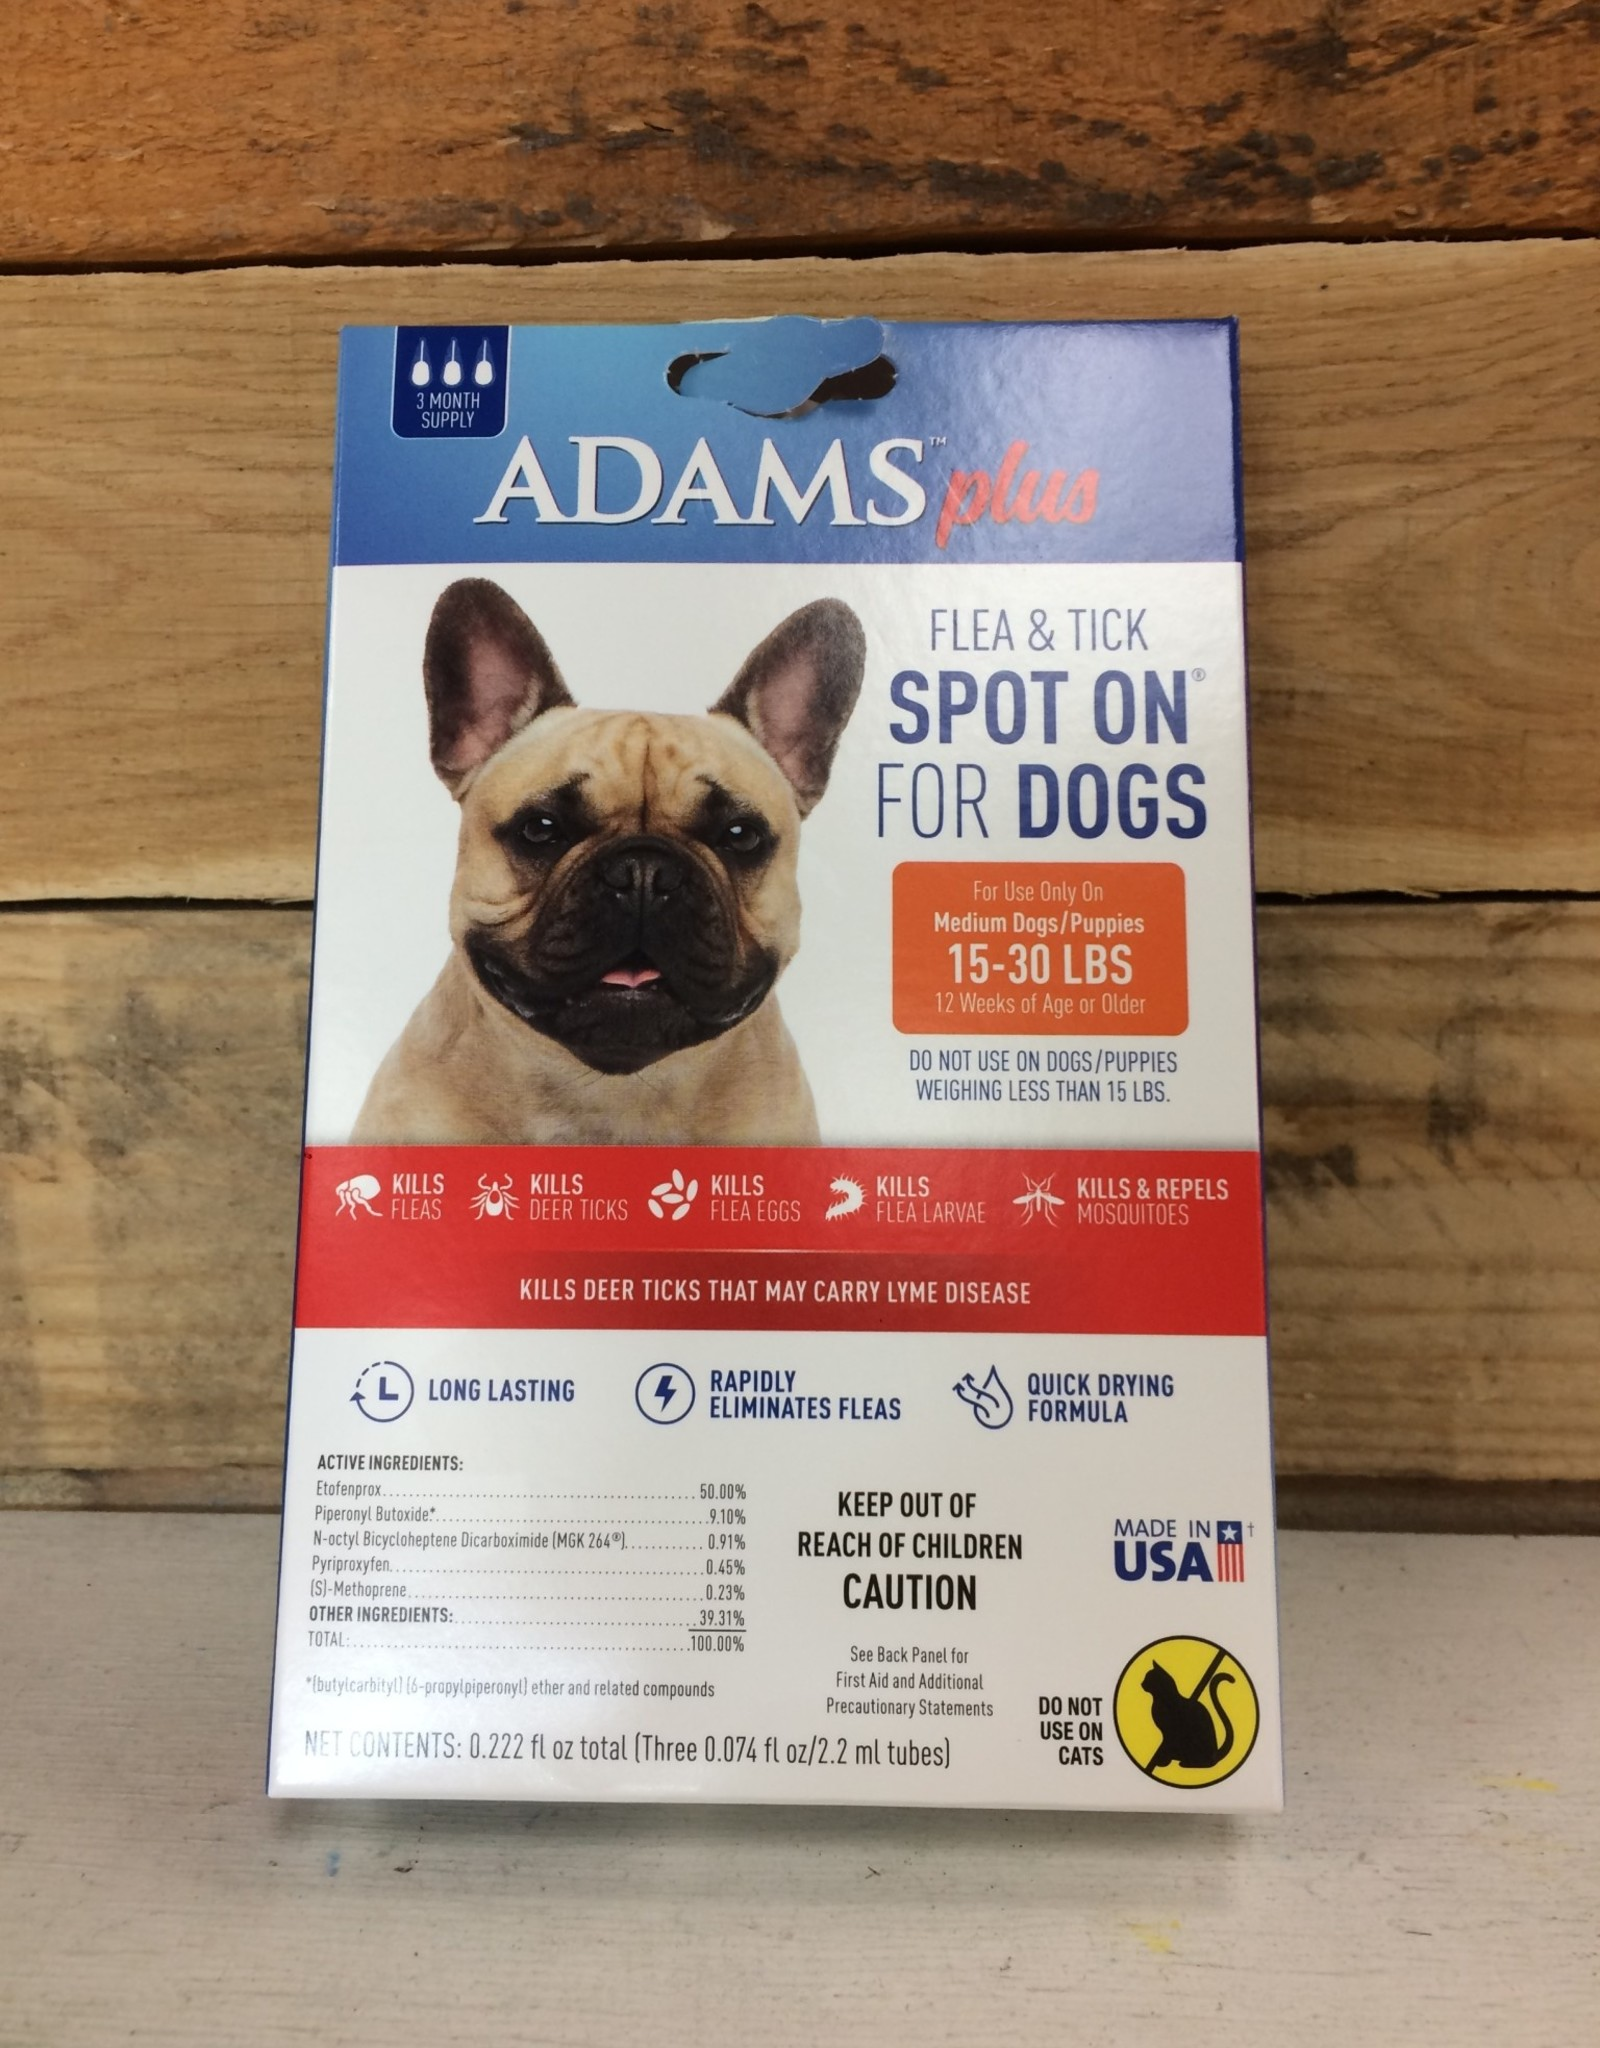 Central Life Sciences- Adams Adams Plus Flea & Tick Spot On Dog Med 3 Month